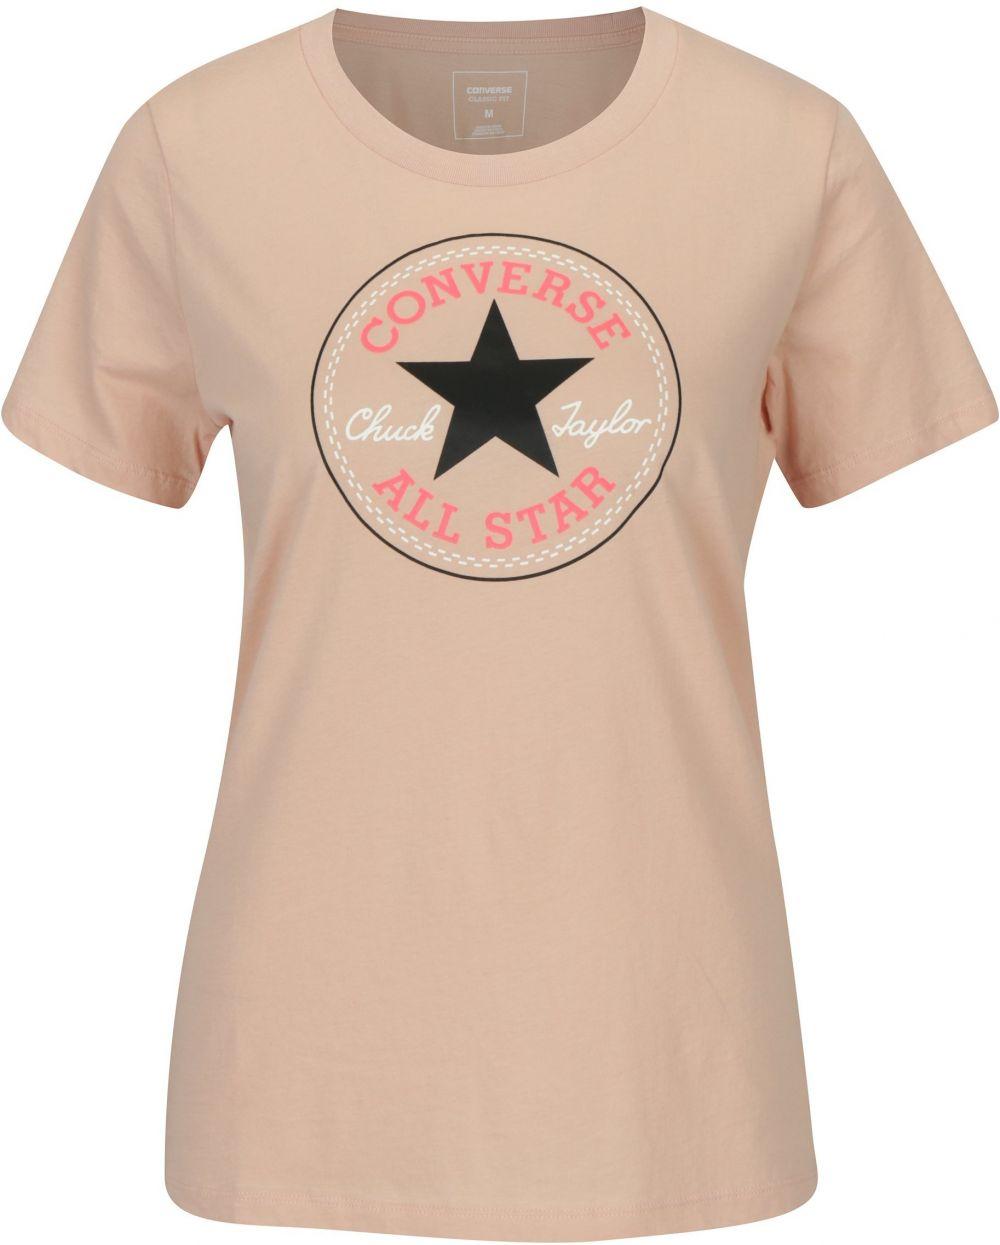 3fe7b05babbd Svetloružové dámske tričko s potlačou Converse Core značky Converse -  Lovely.sk